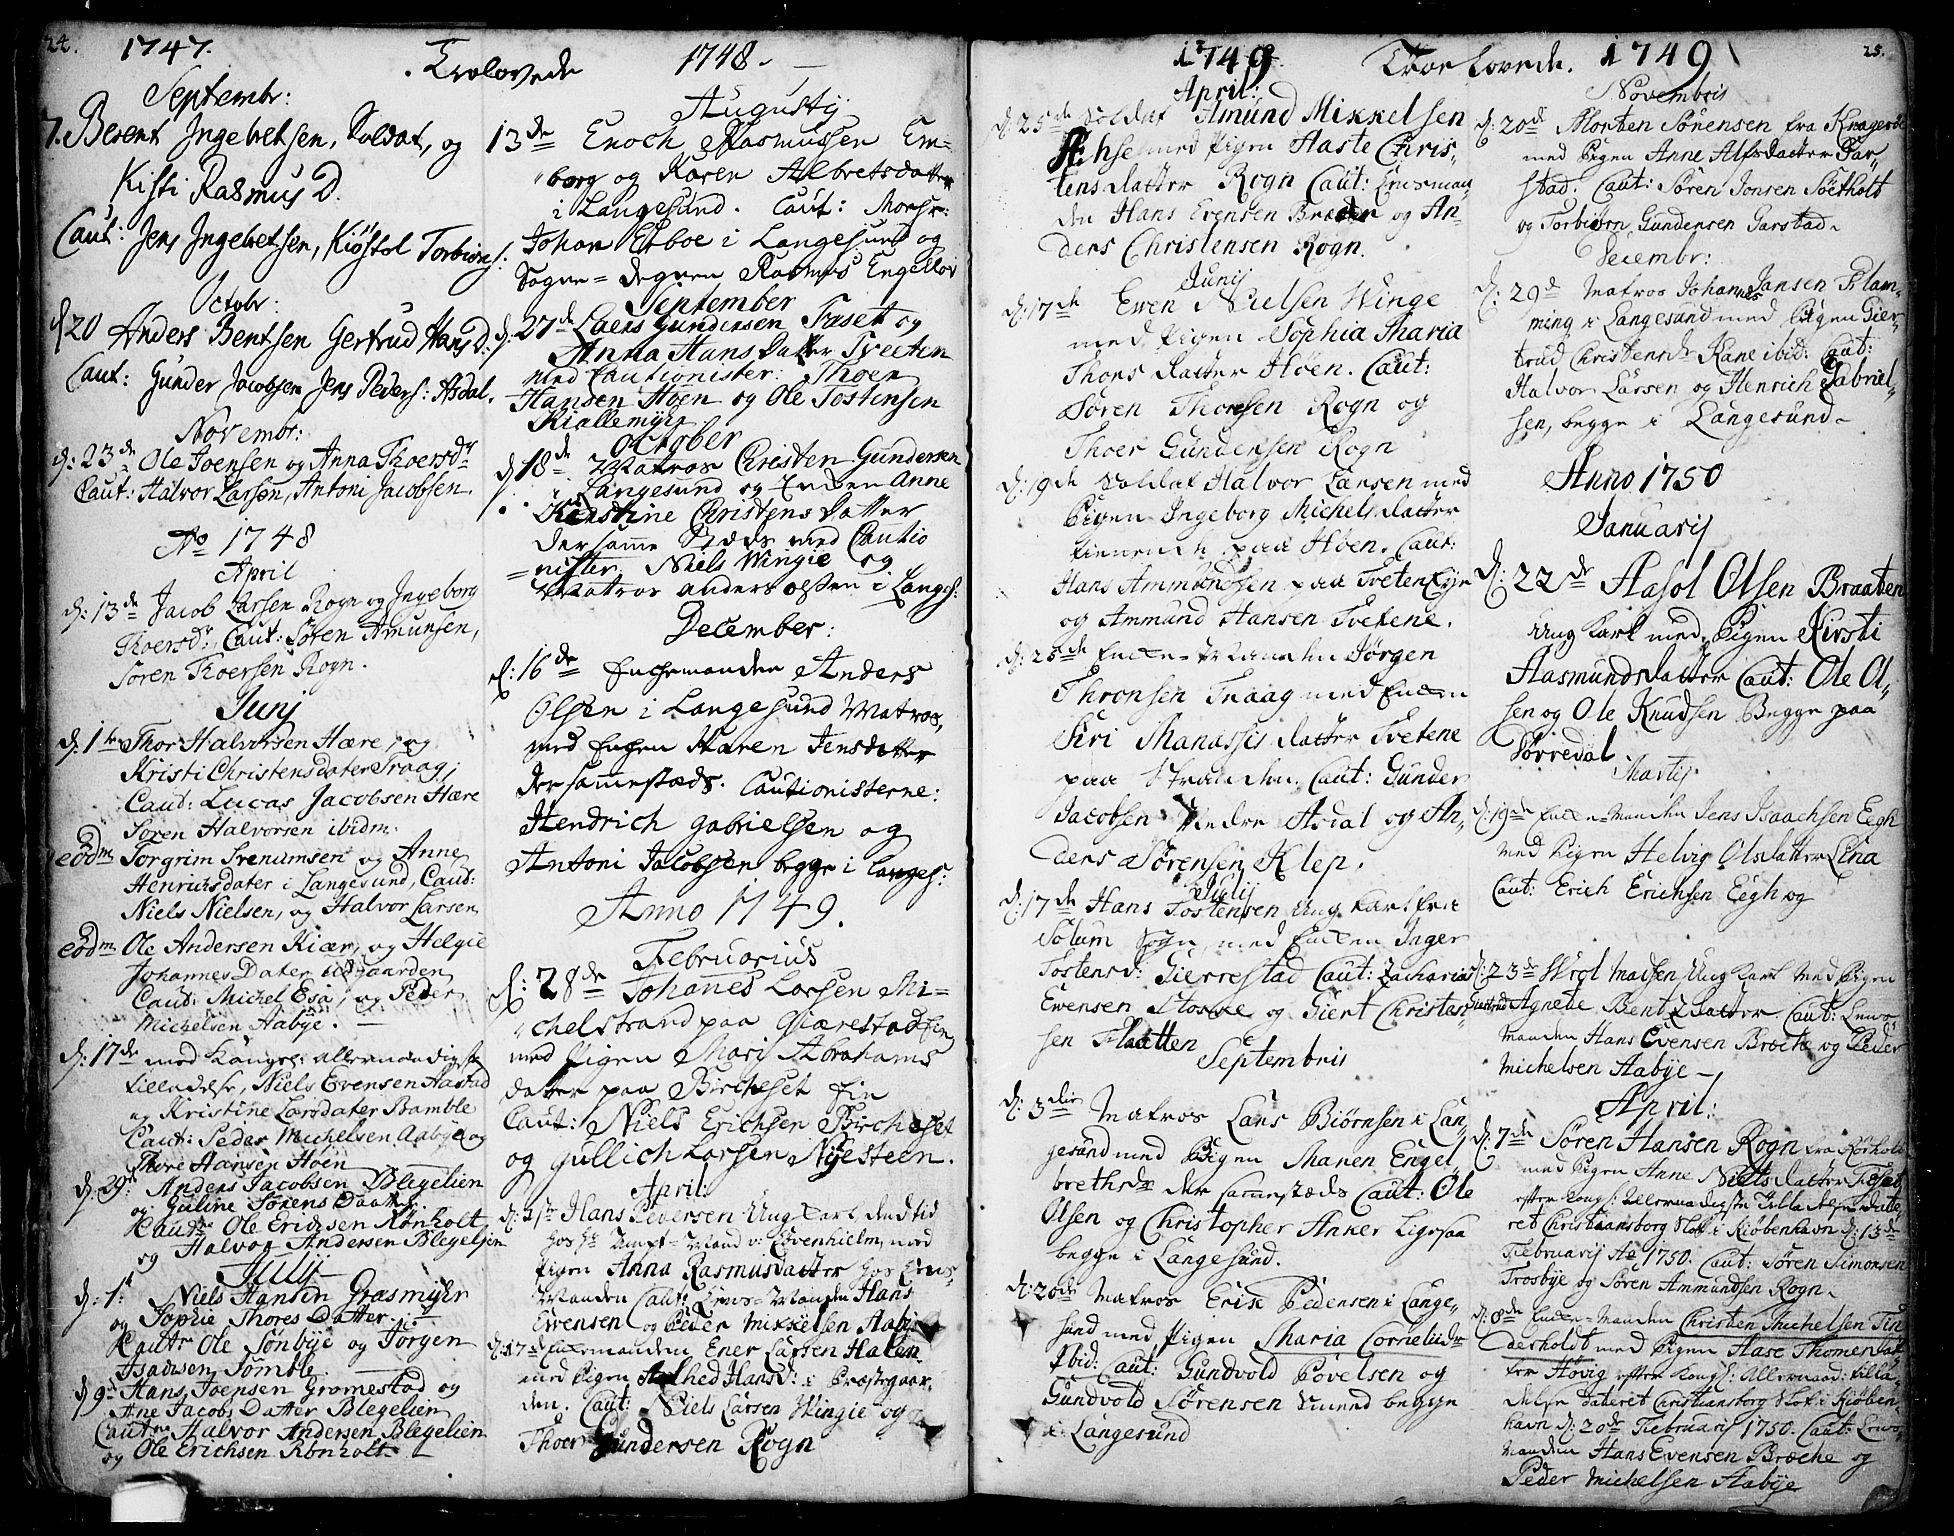 SAKO, Bamble kirkebøker, F/Fa/L0001: Ministerialbok nr. I 1, 1702-1774, s. 24-25